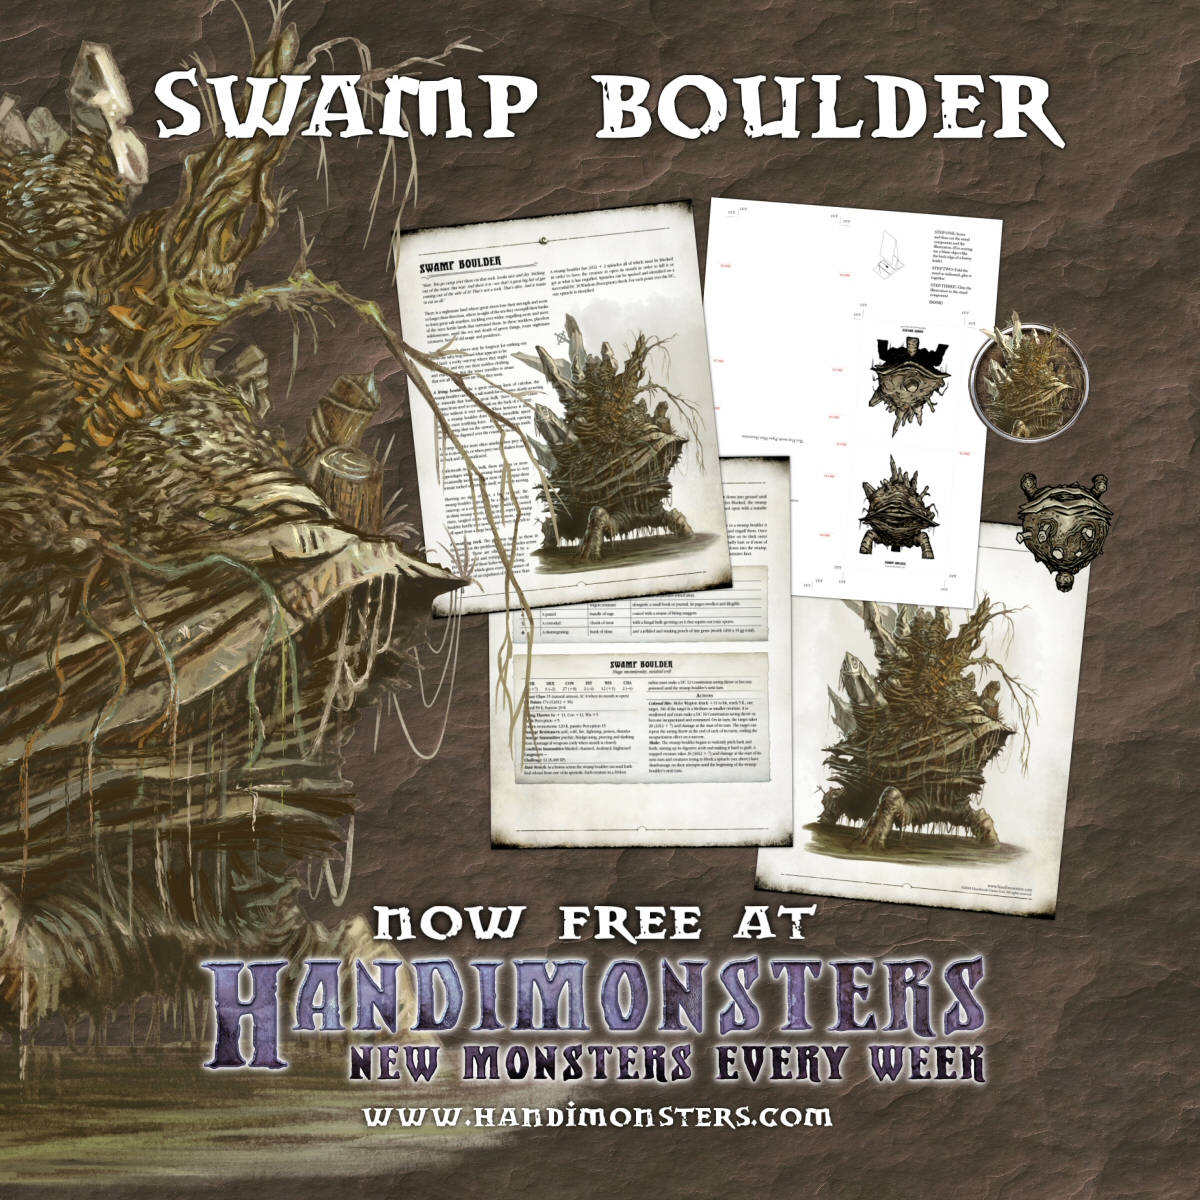 Swamp-Boulder-Insta-ad.jpg